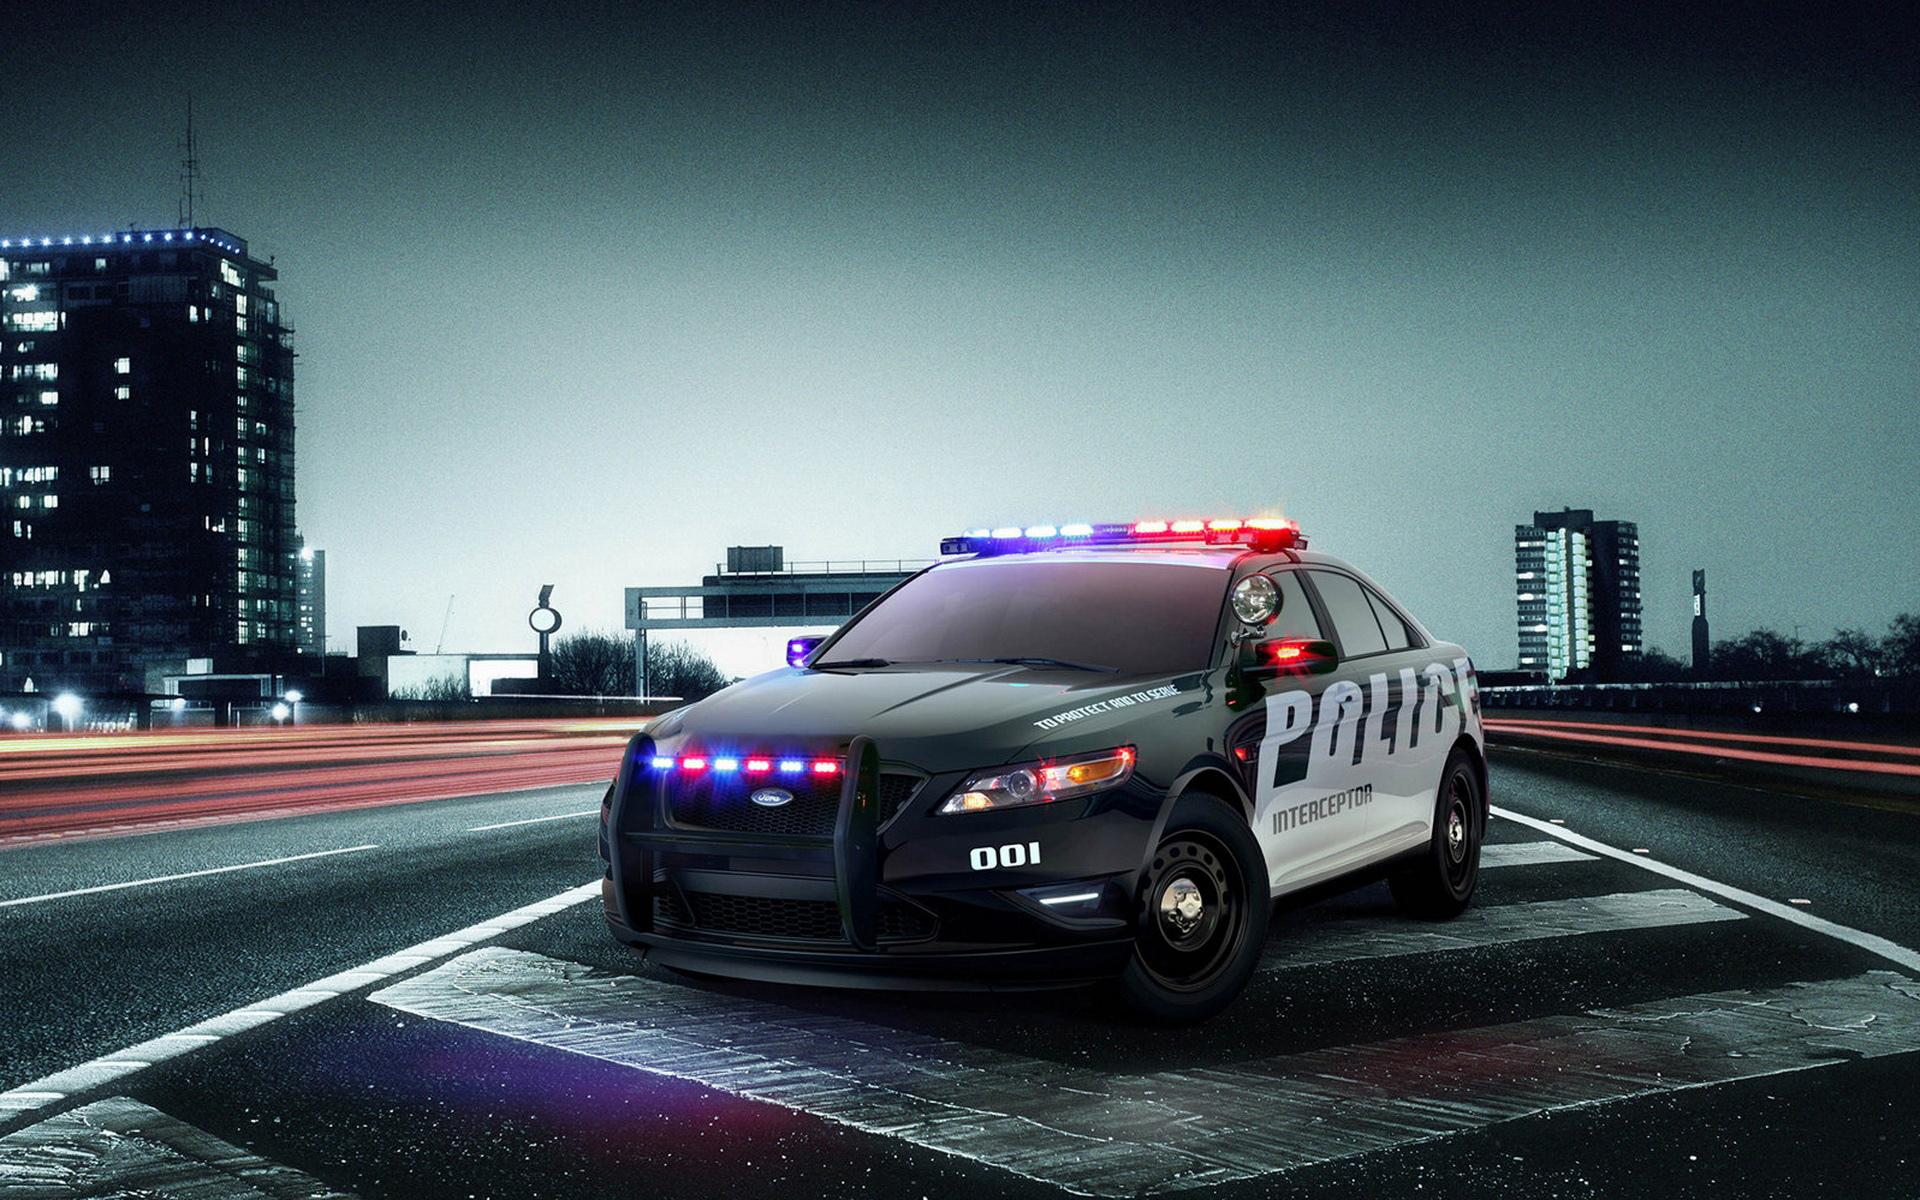 Police без смс